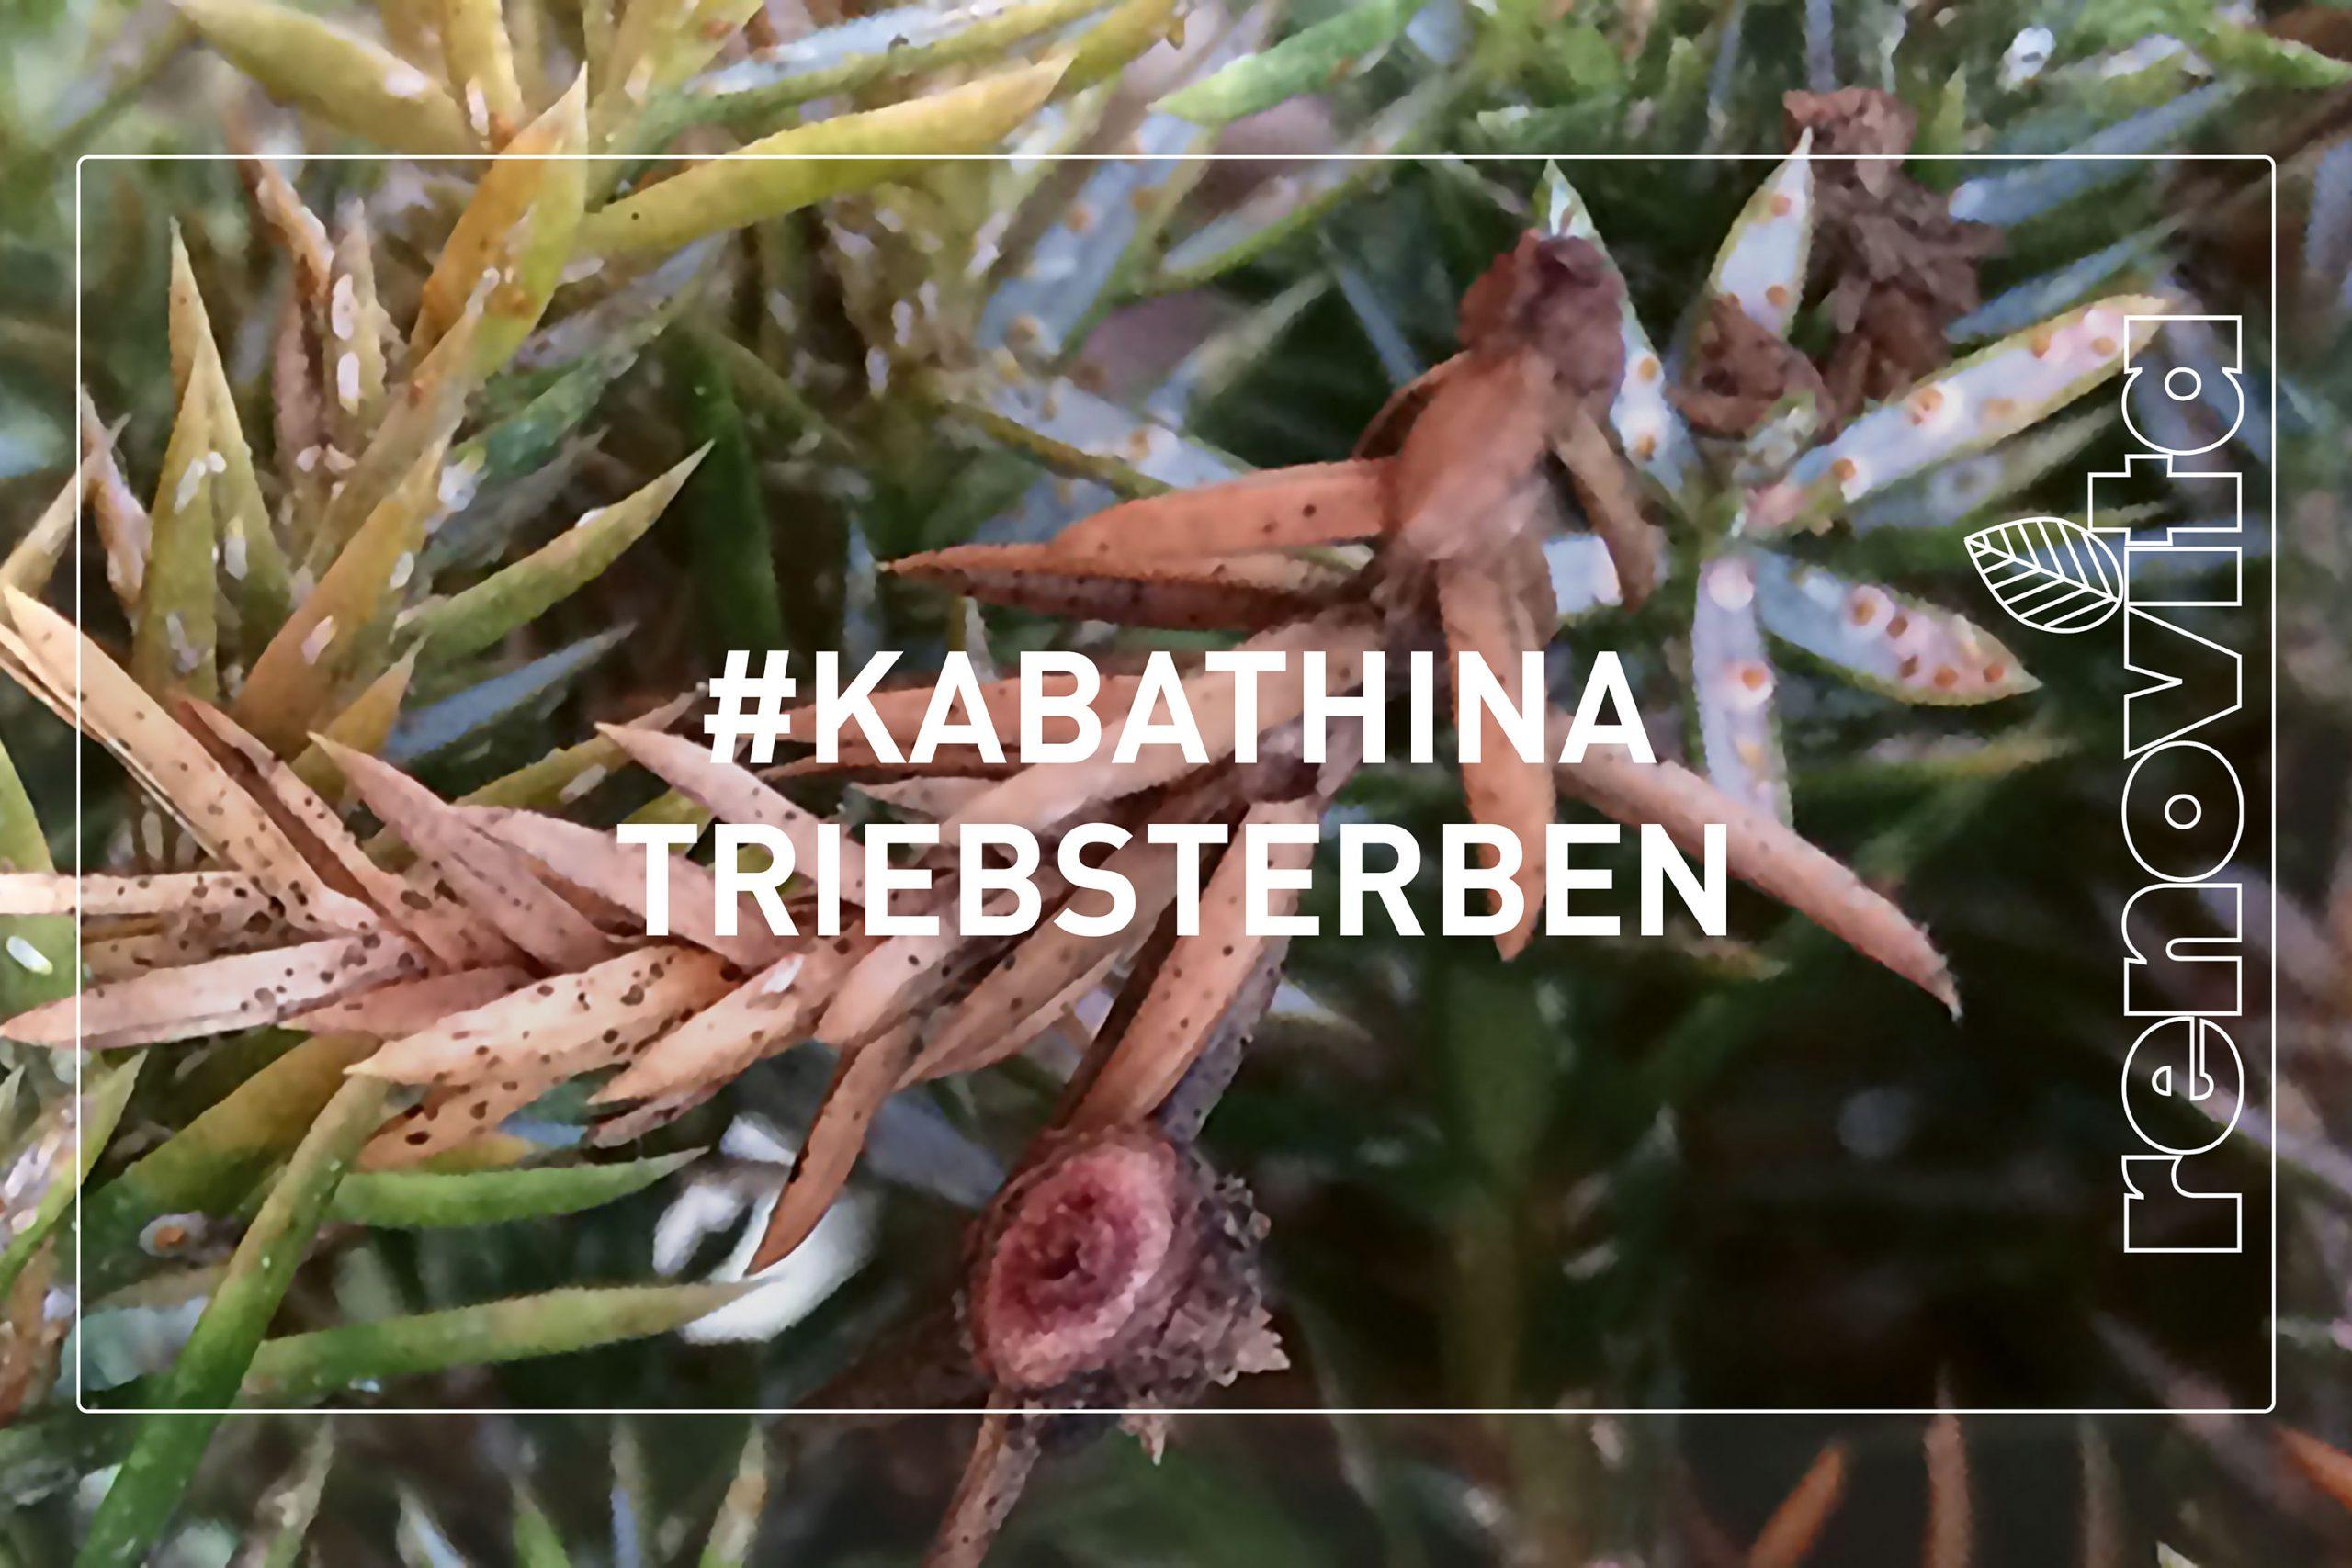 Kabathina Triebsterben